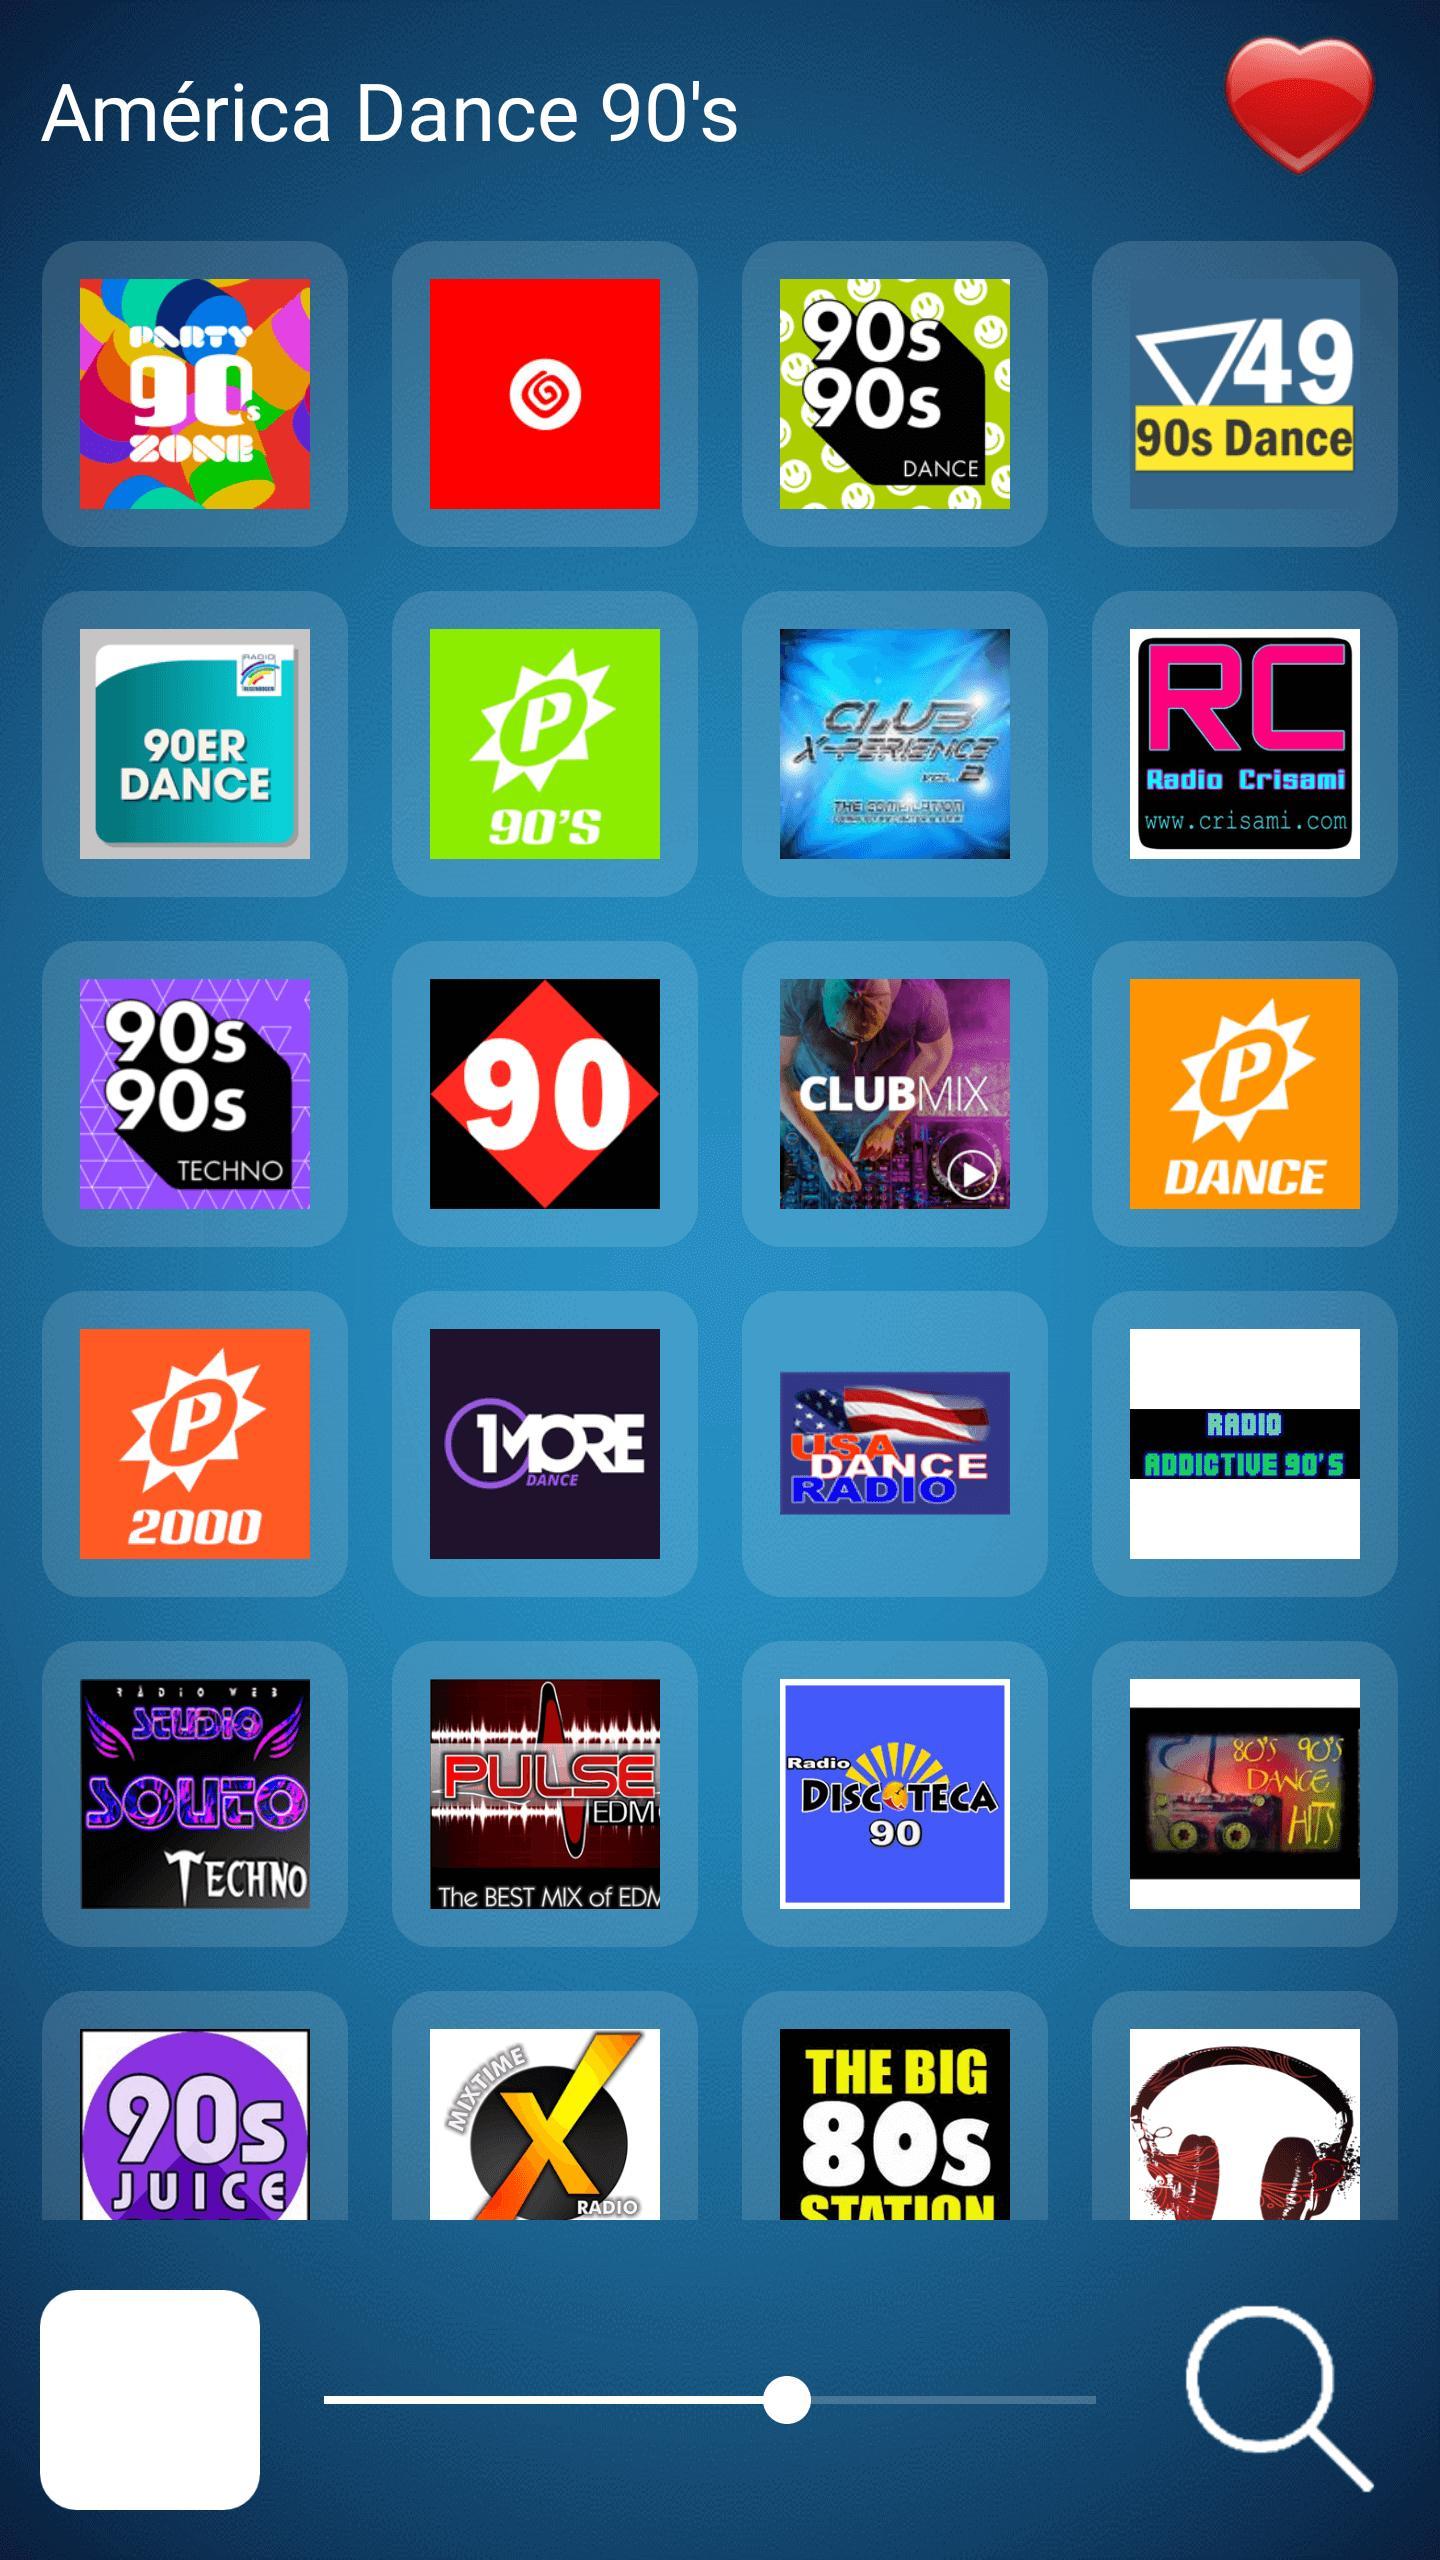 TÉLÉCHARGER GRATUITEMENT LOGICIEL SUNU RADIO TV